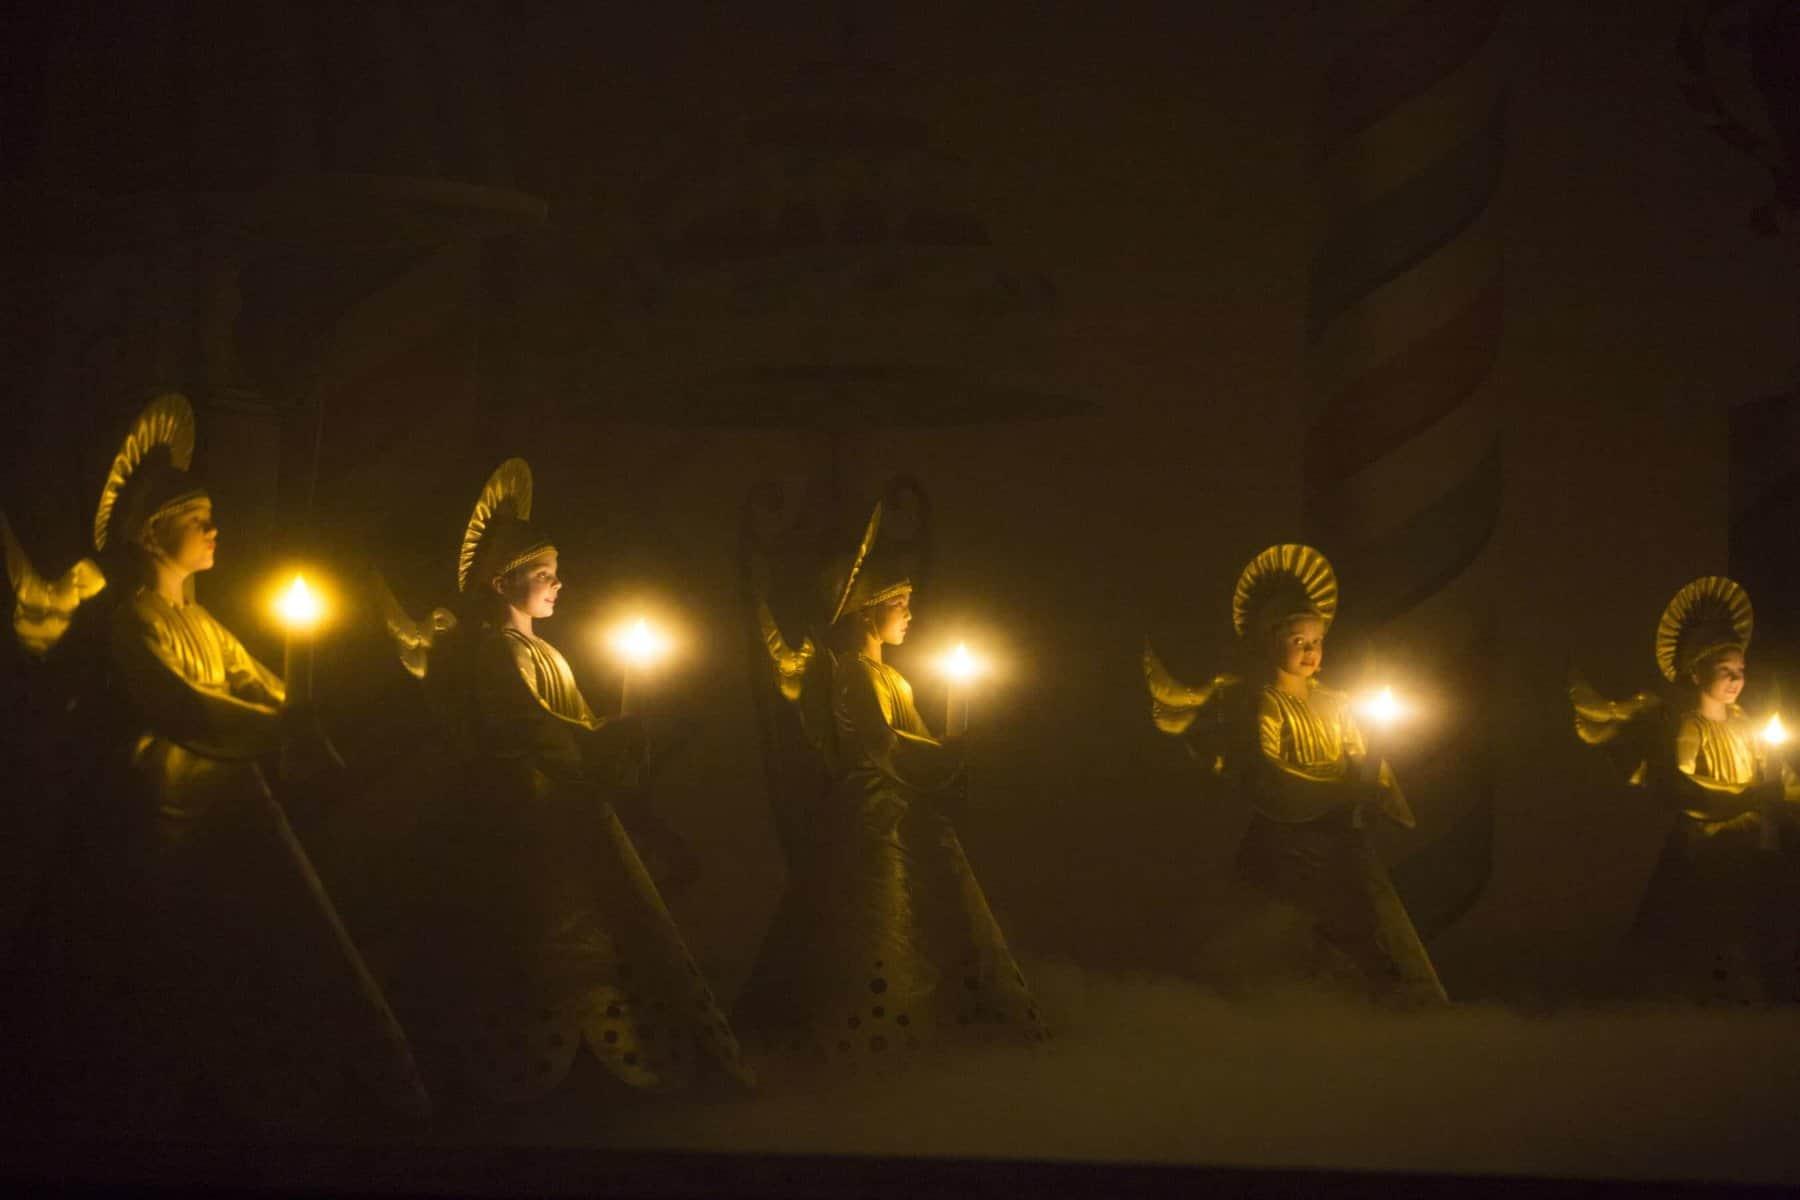 Angels. George Balanchine's The Nutcracker®, choreography by George Balanchine © The George Balanchine Trust. Photo © Angela Sterling.